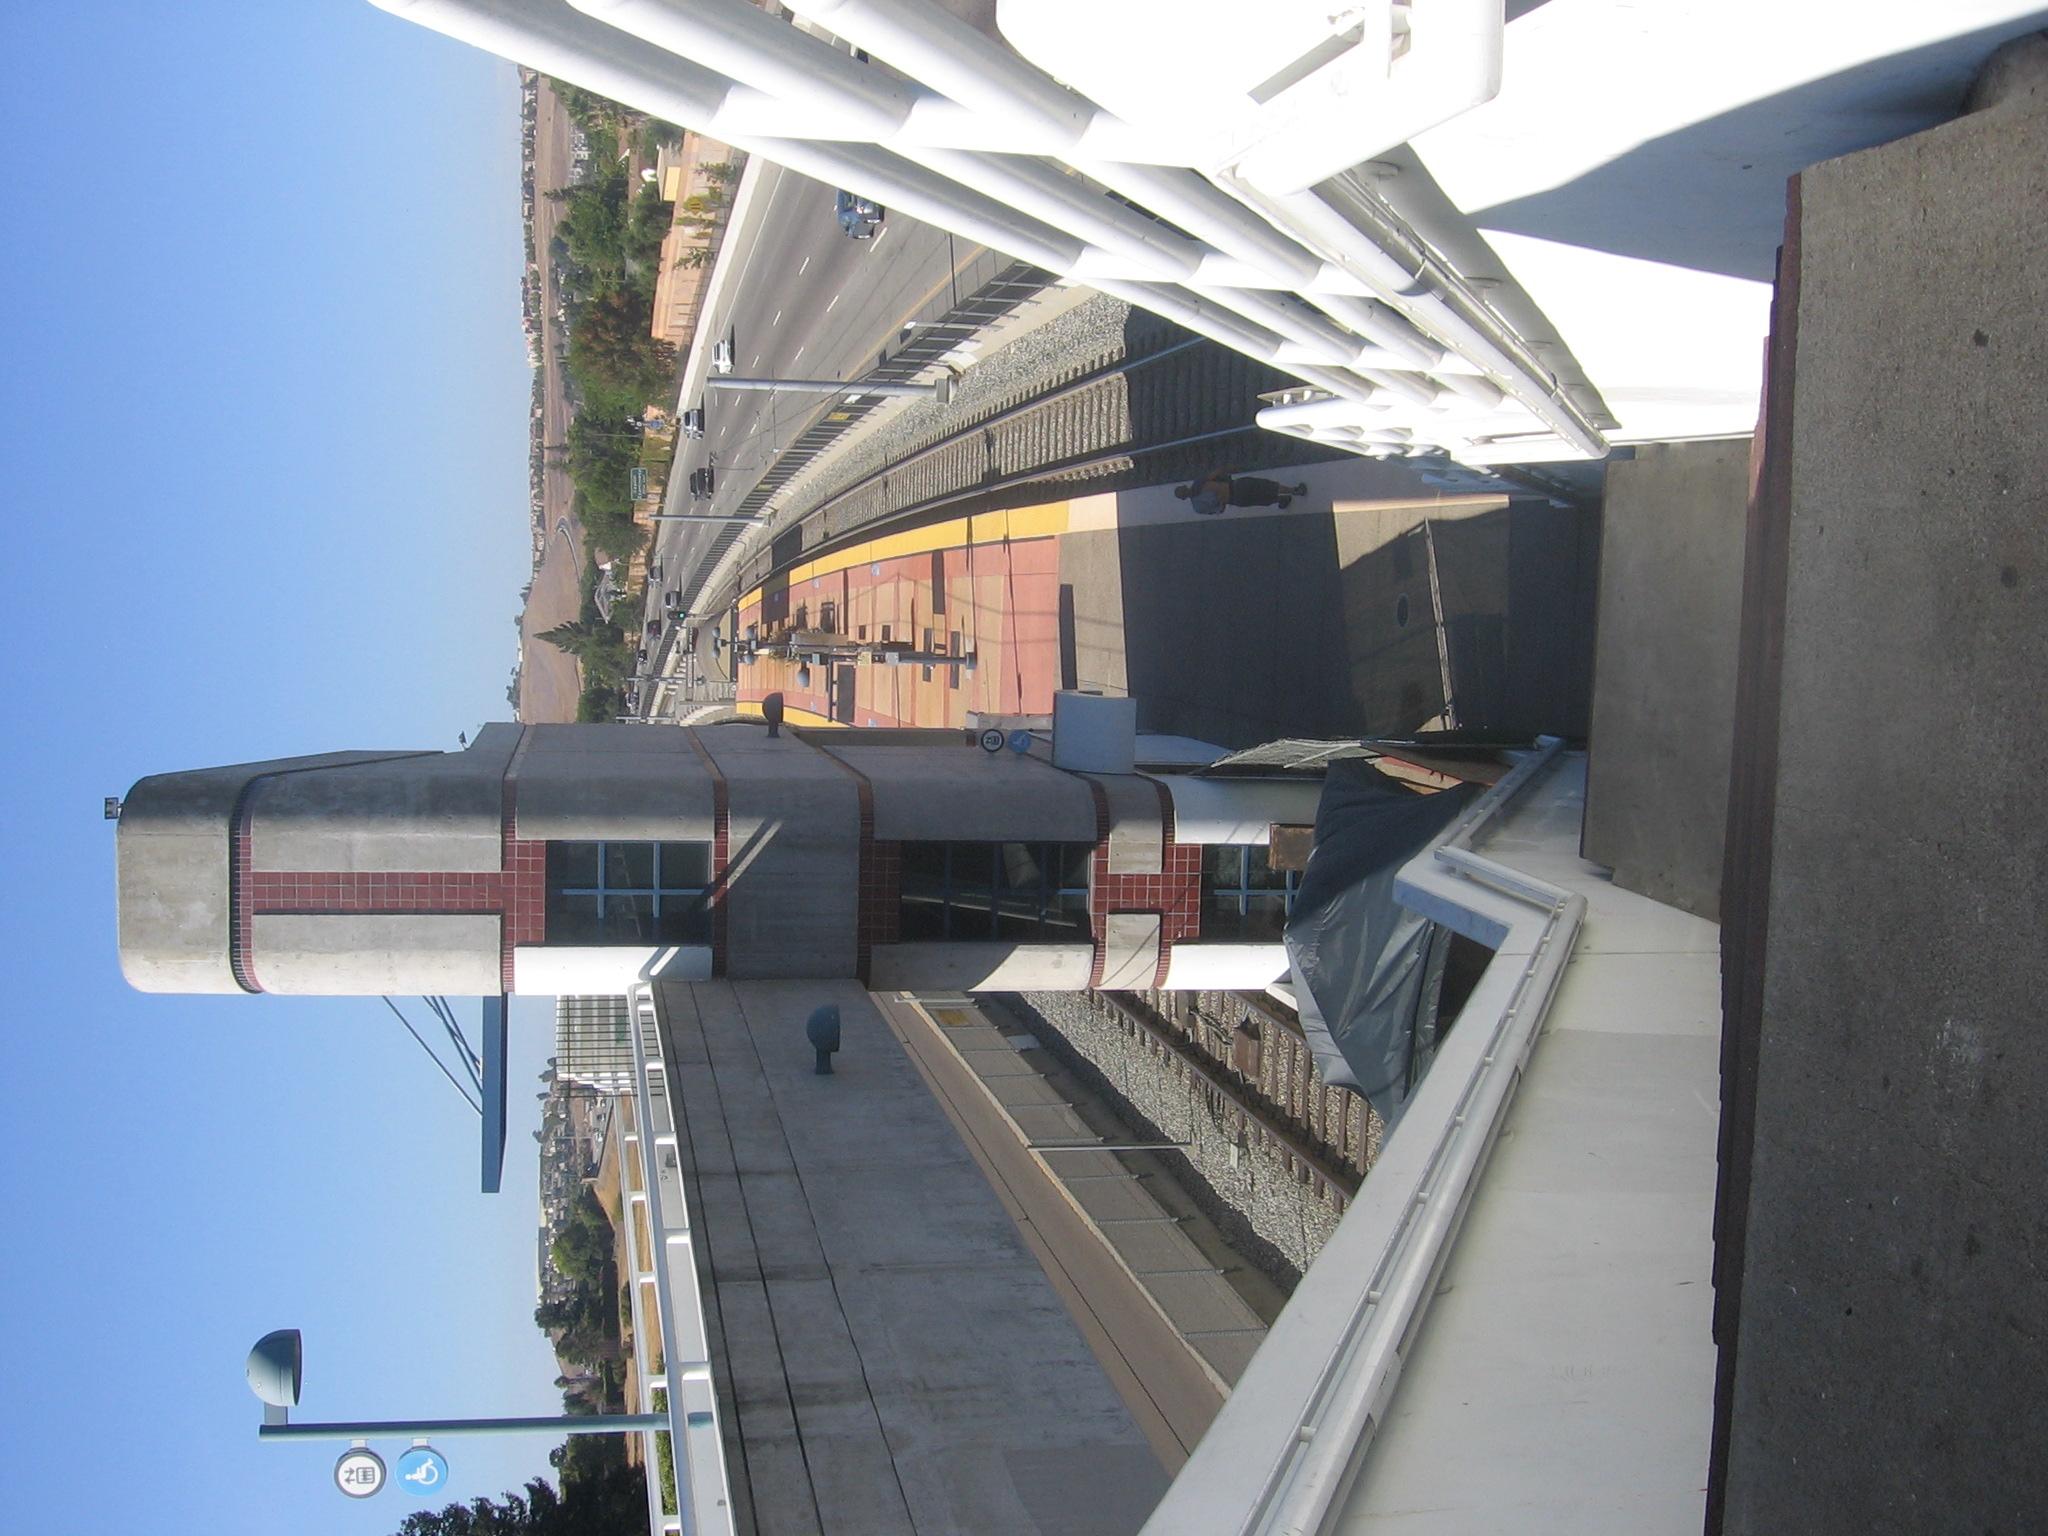 Image Result For Vta Light Rail